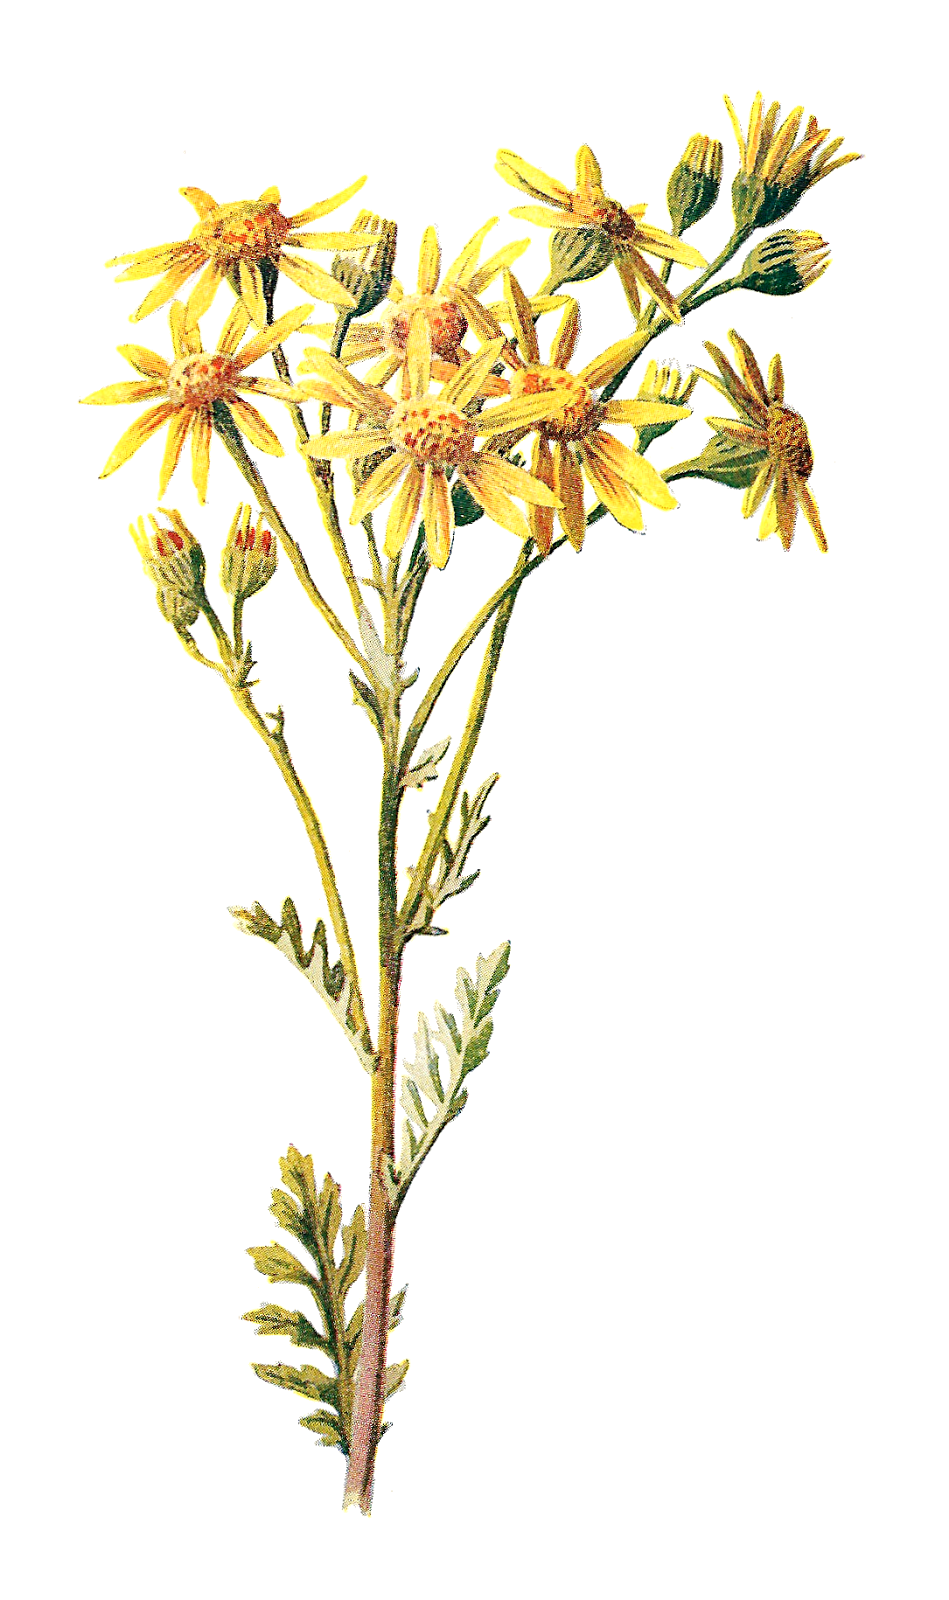 Wildflower clipart yellow flower Digital  Stock Image Illustration